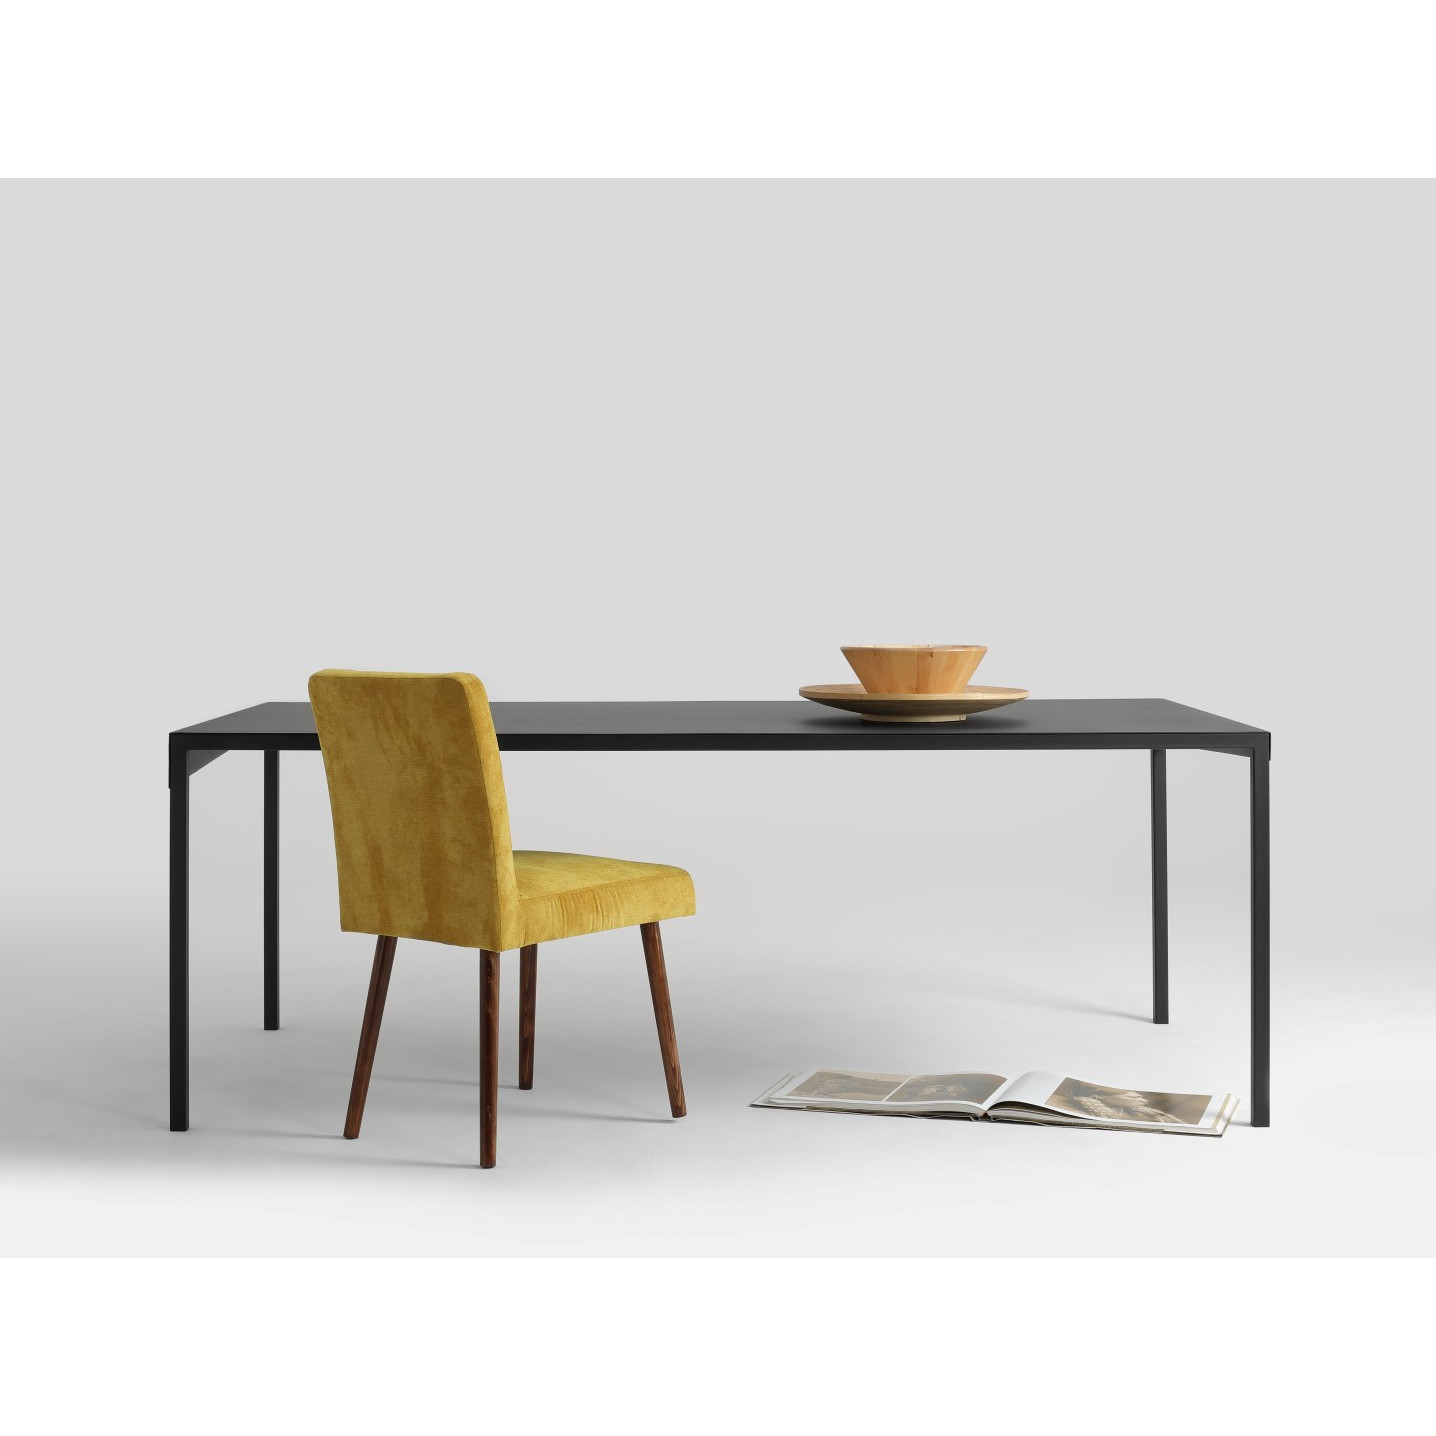 Dining Table Obroos | Black